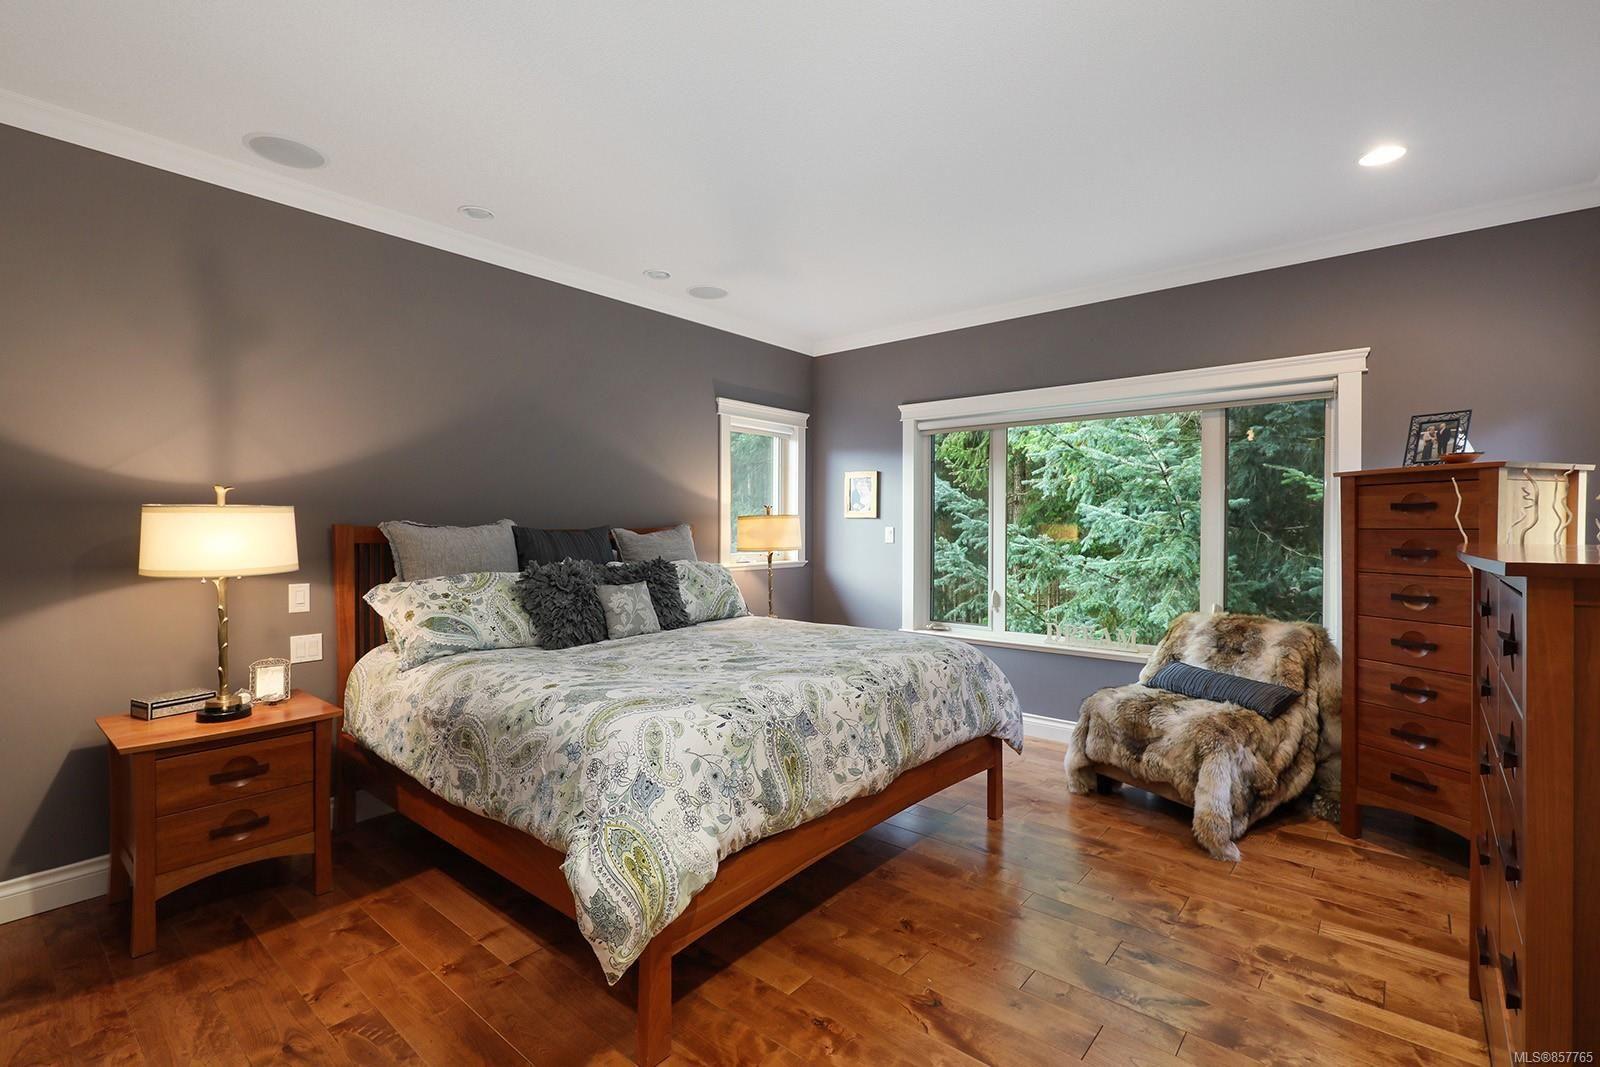 Photo 27: Photos: 1516 Highridge Dr in : CV Comox (Town of) House for sale (Comox Valley)  : MLS®# 857765